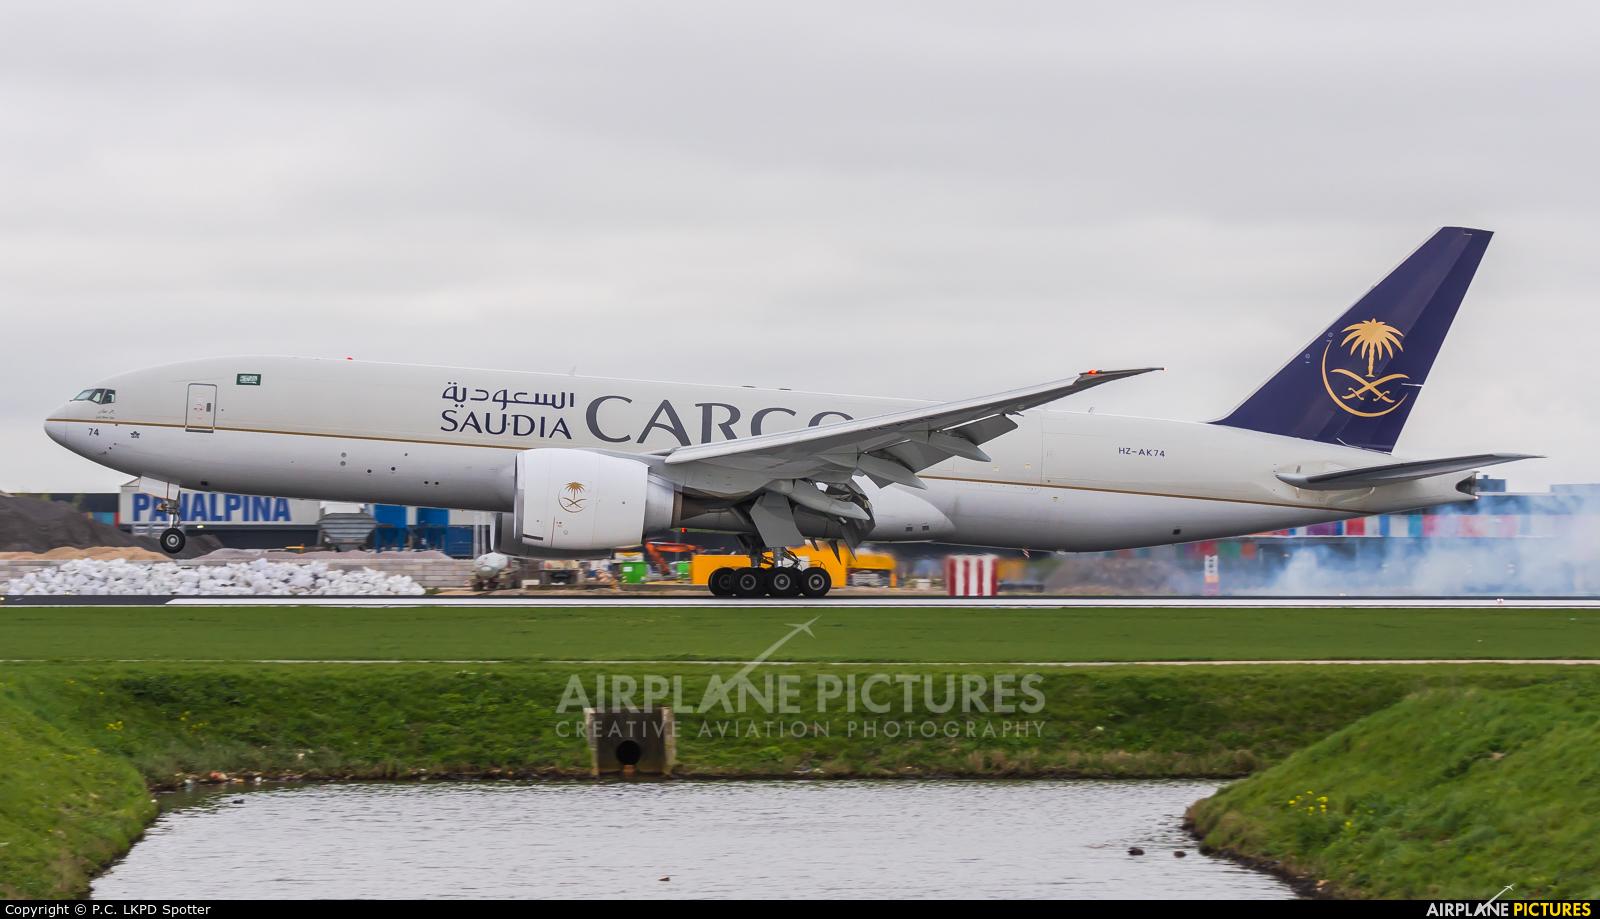 Saudi Arabian Cargo HZ-AK74 aircraft at Amsterdam - Schiphol